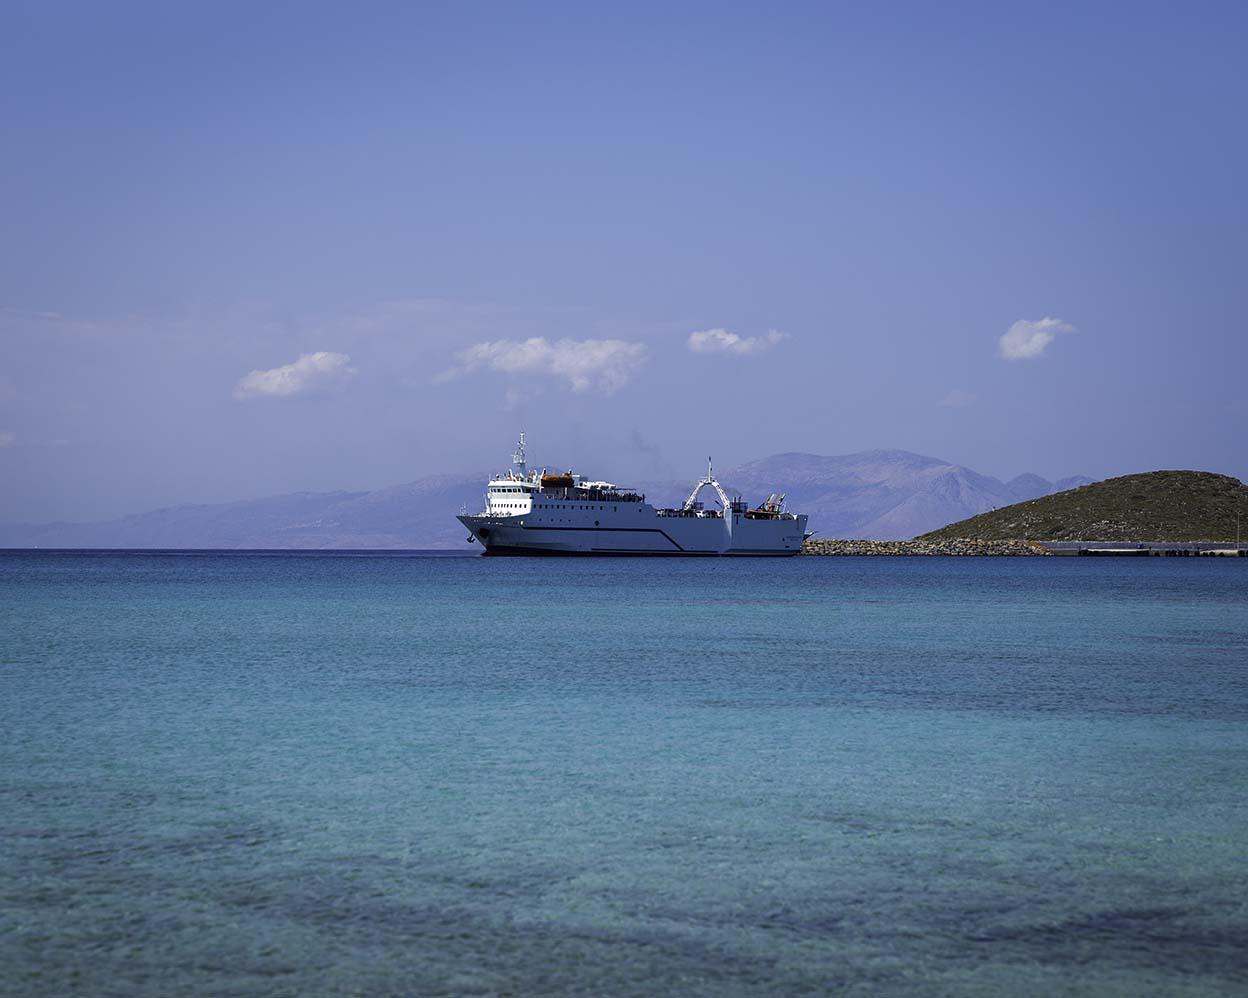 Diakofti, Grèce, gildalliere, 2018